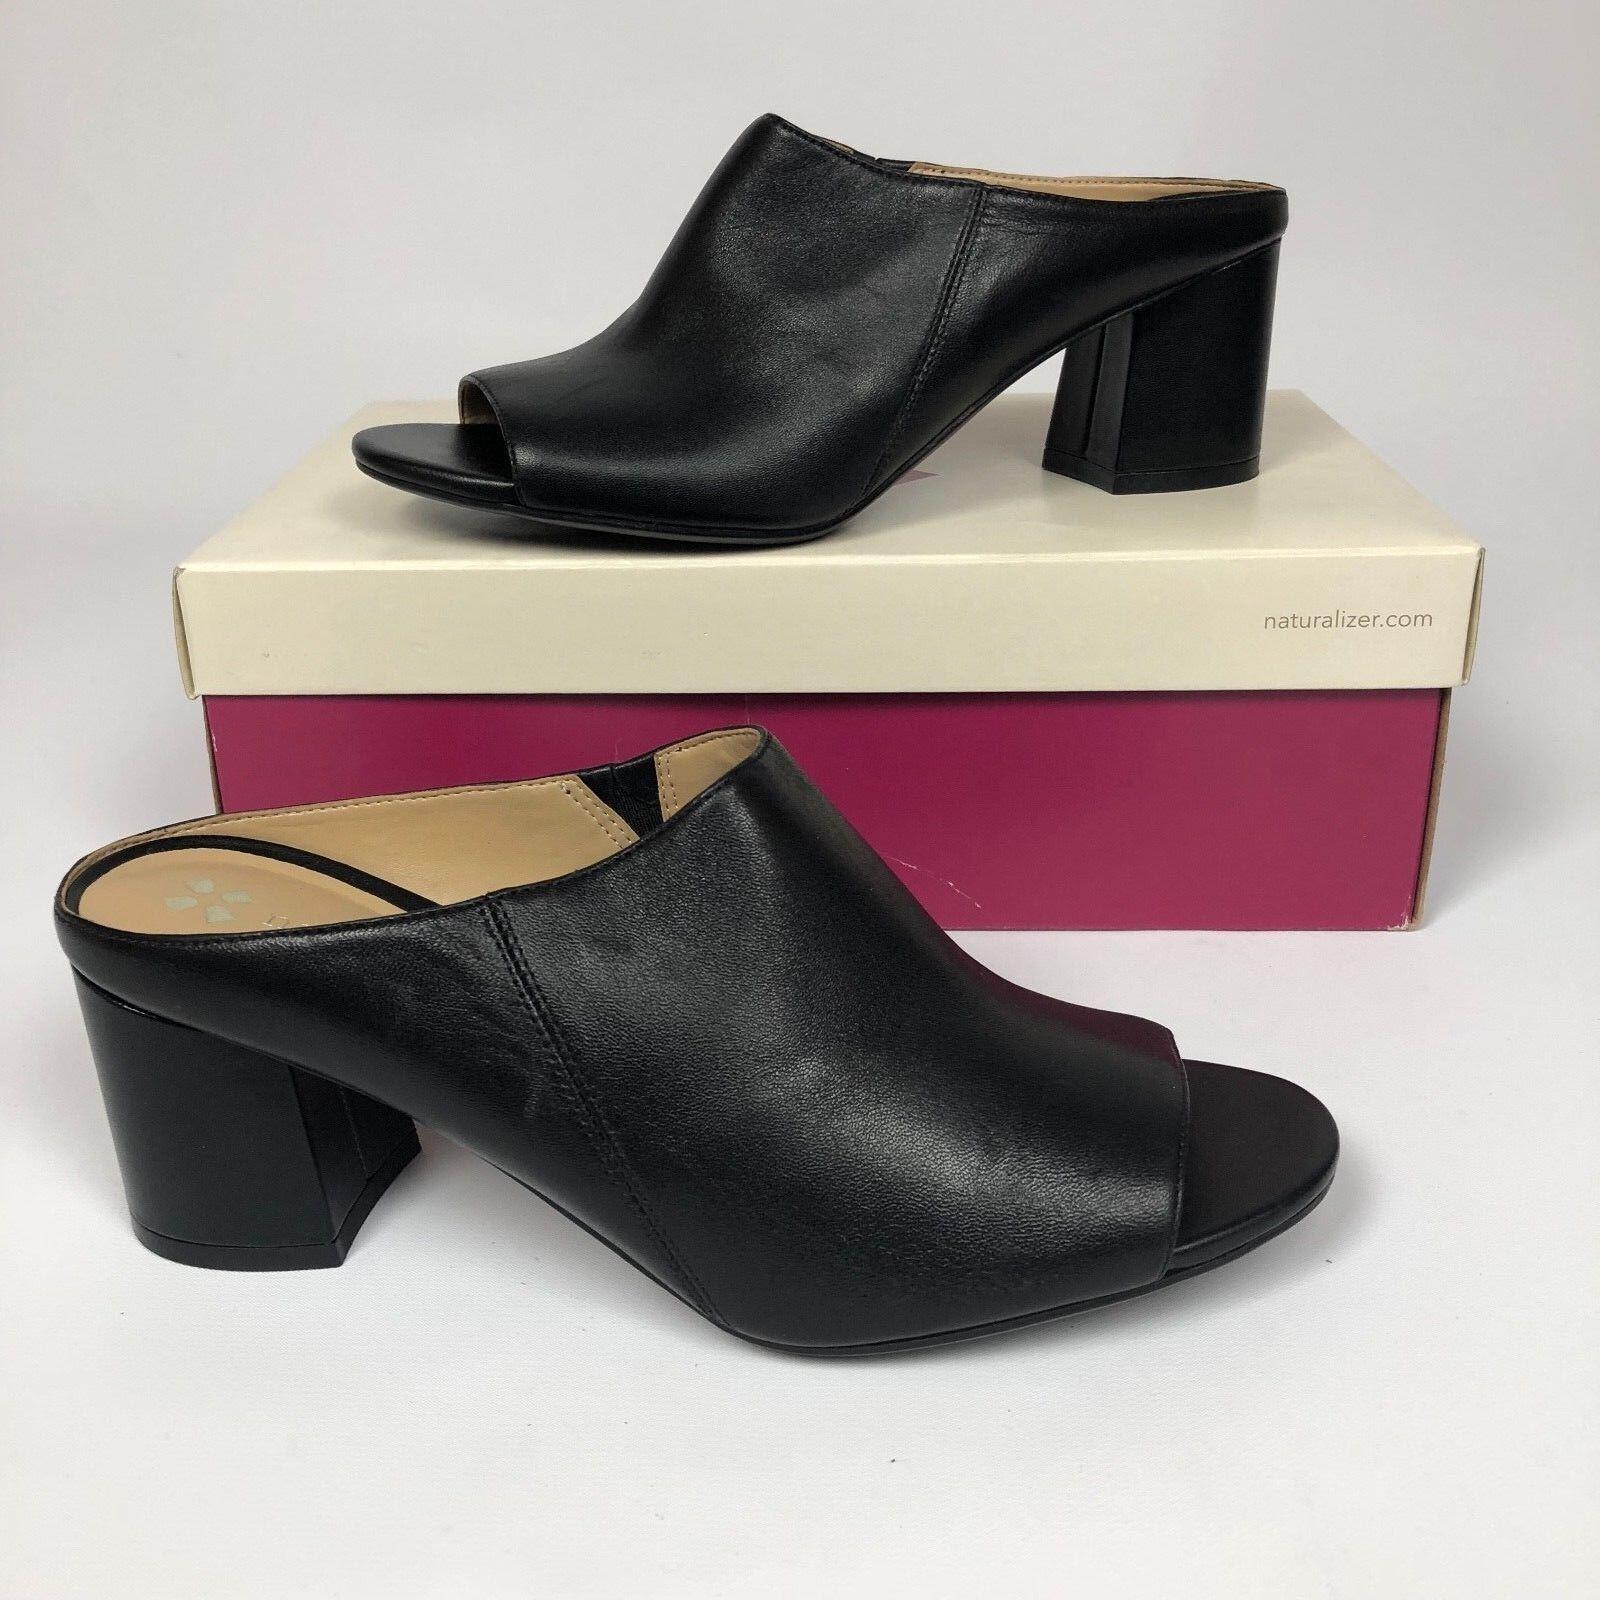 Naturalizer Women's Cyprine Dress Sandals Heels Black 7.5N